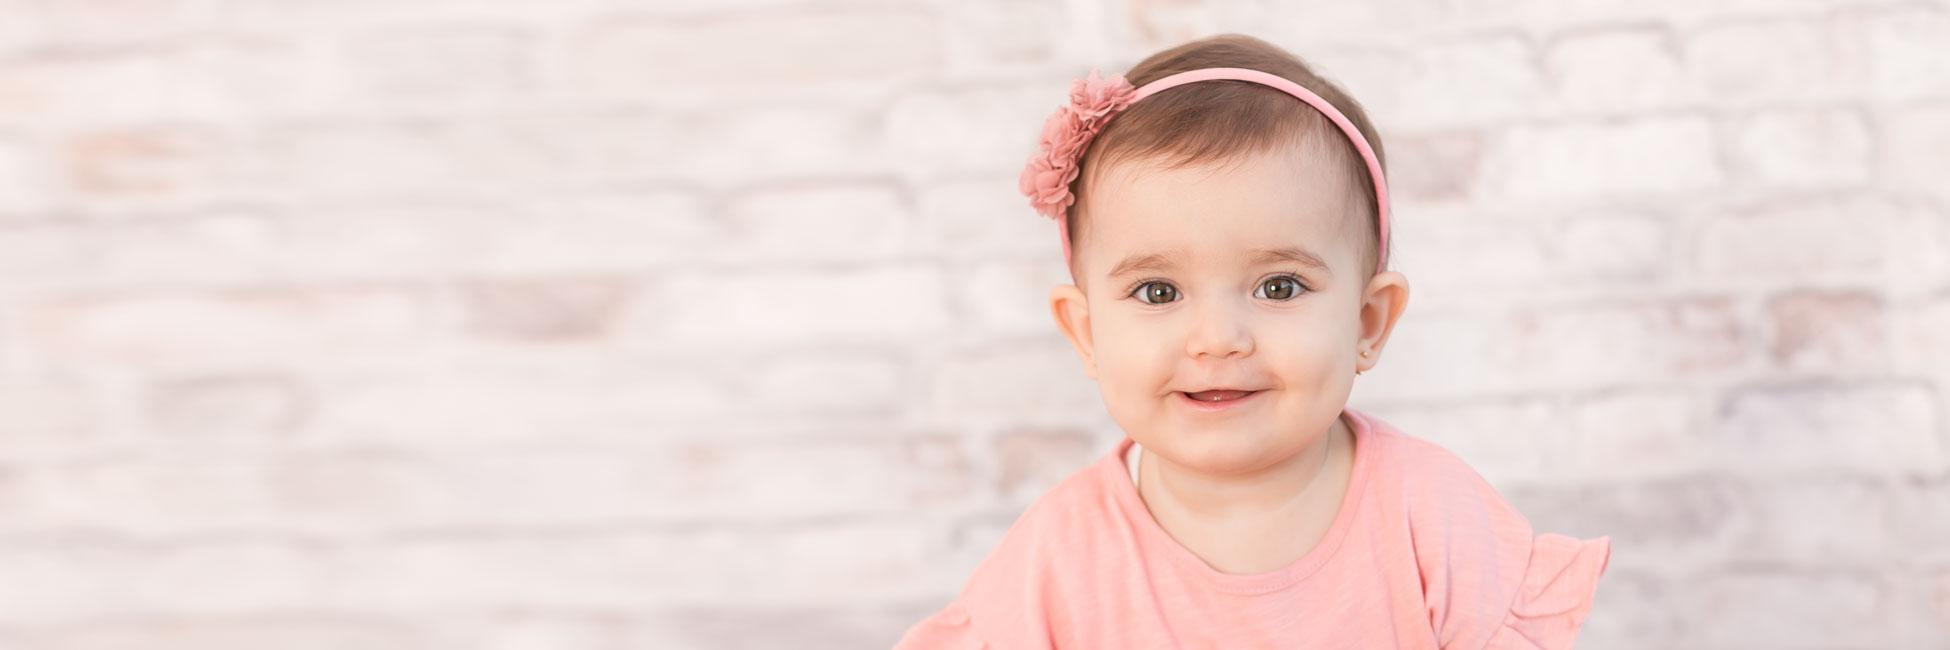 Accesorios de pelo para bebé